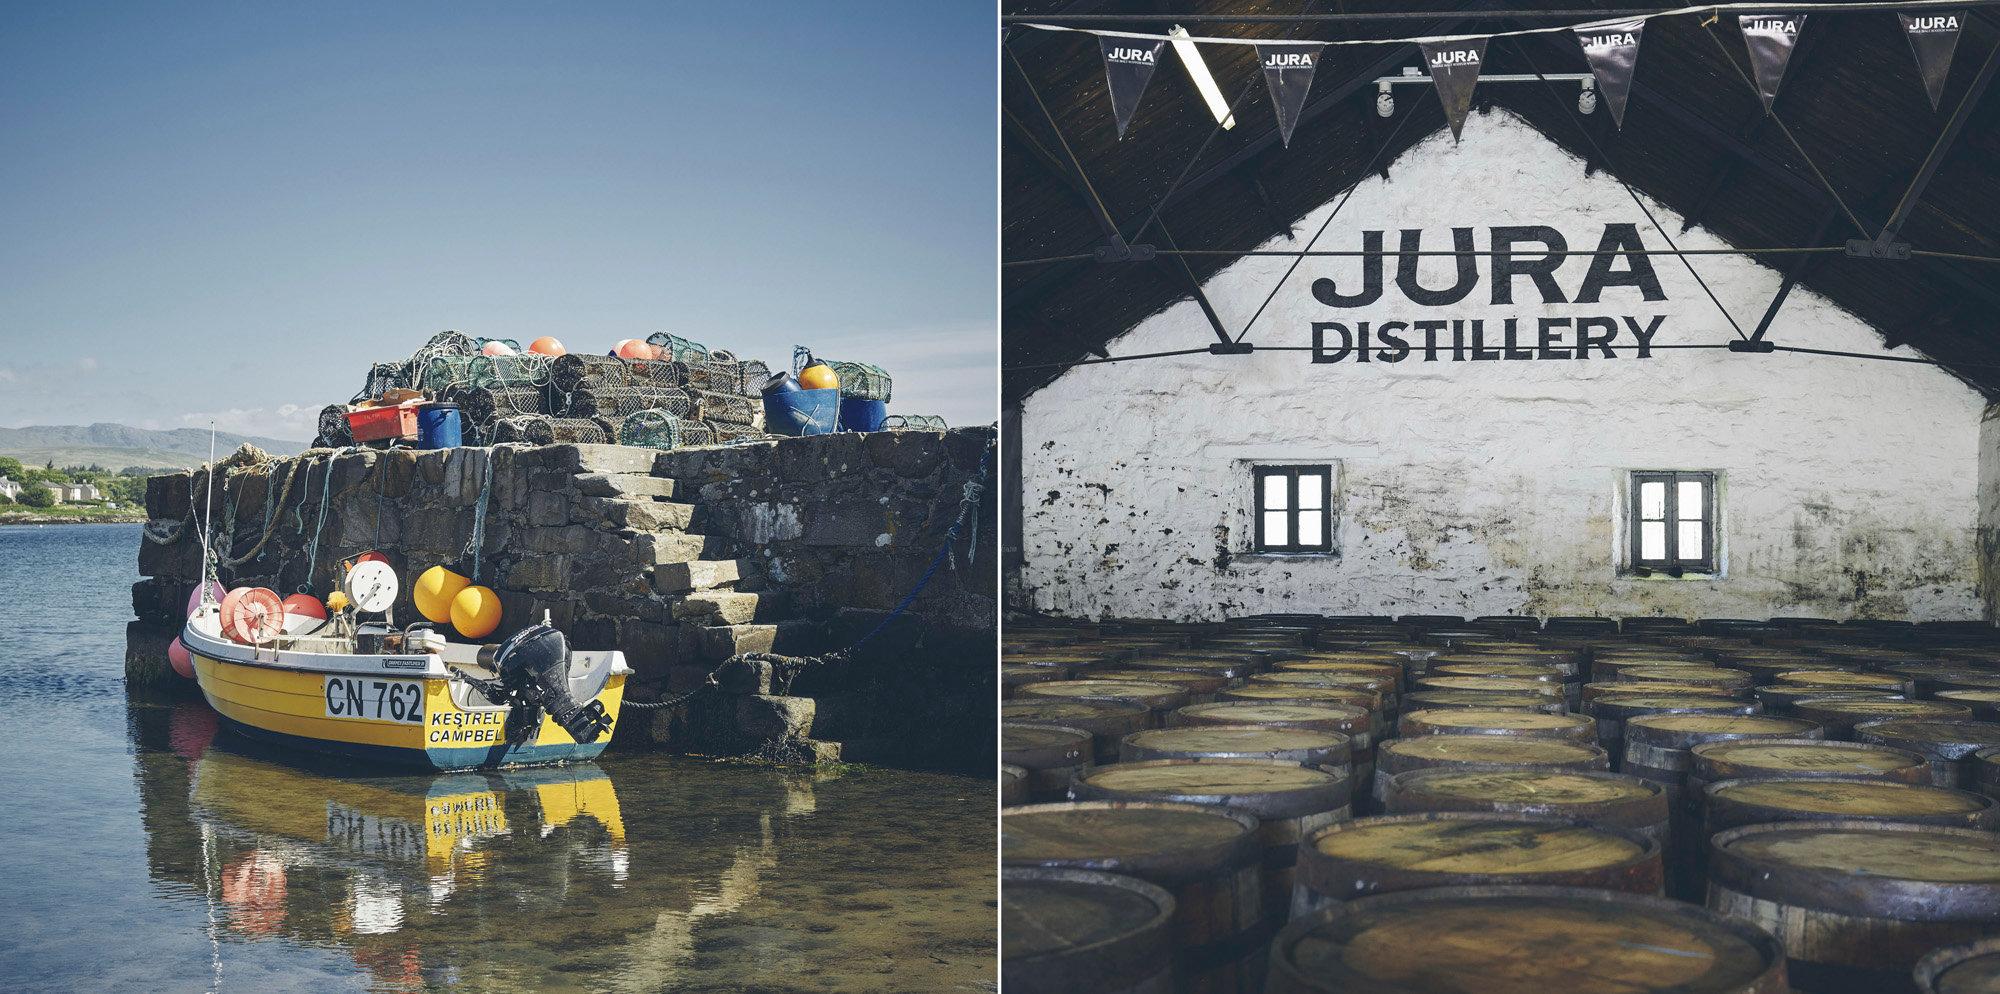 Jura - Scotland